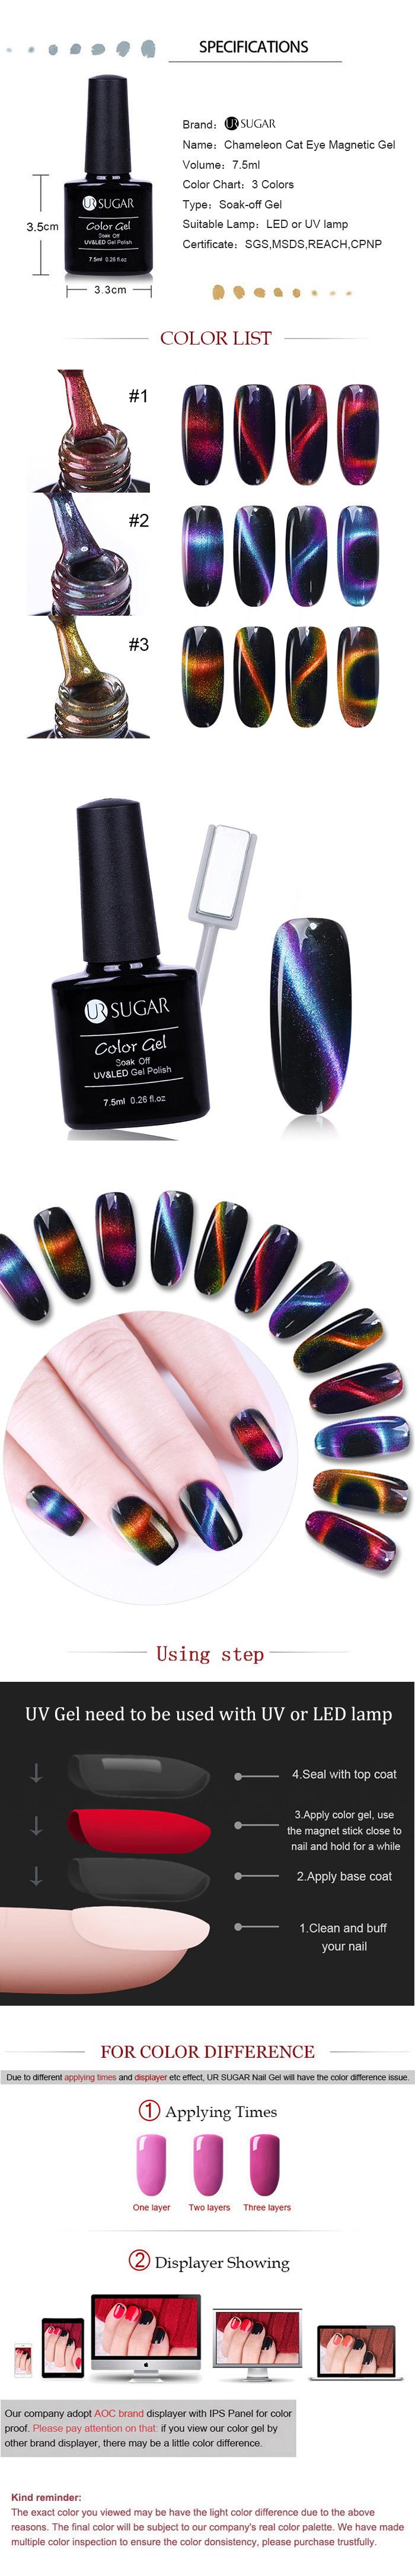 Nail Gel Beauty & Health Ur Sugar 7.5ml 3d Chameleon Cat Eye Magnetic Gel Magic Stick Gradient Effect Soak Off Uv Led Nail Gel Polish Lacquer